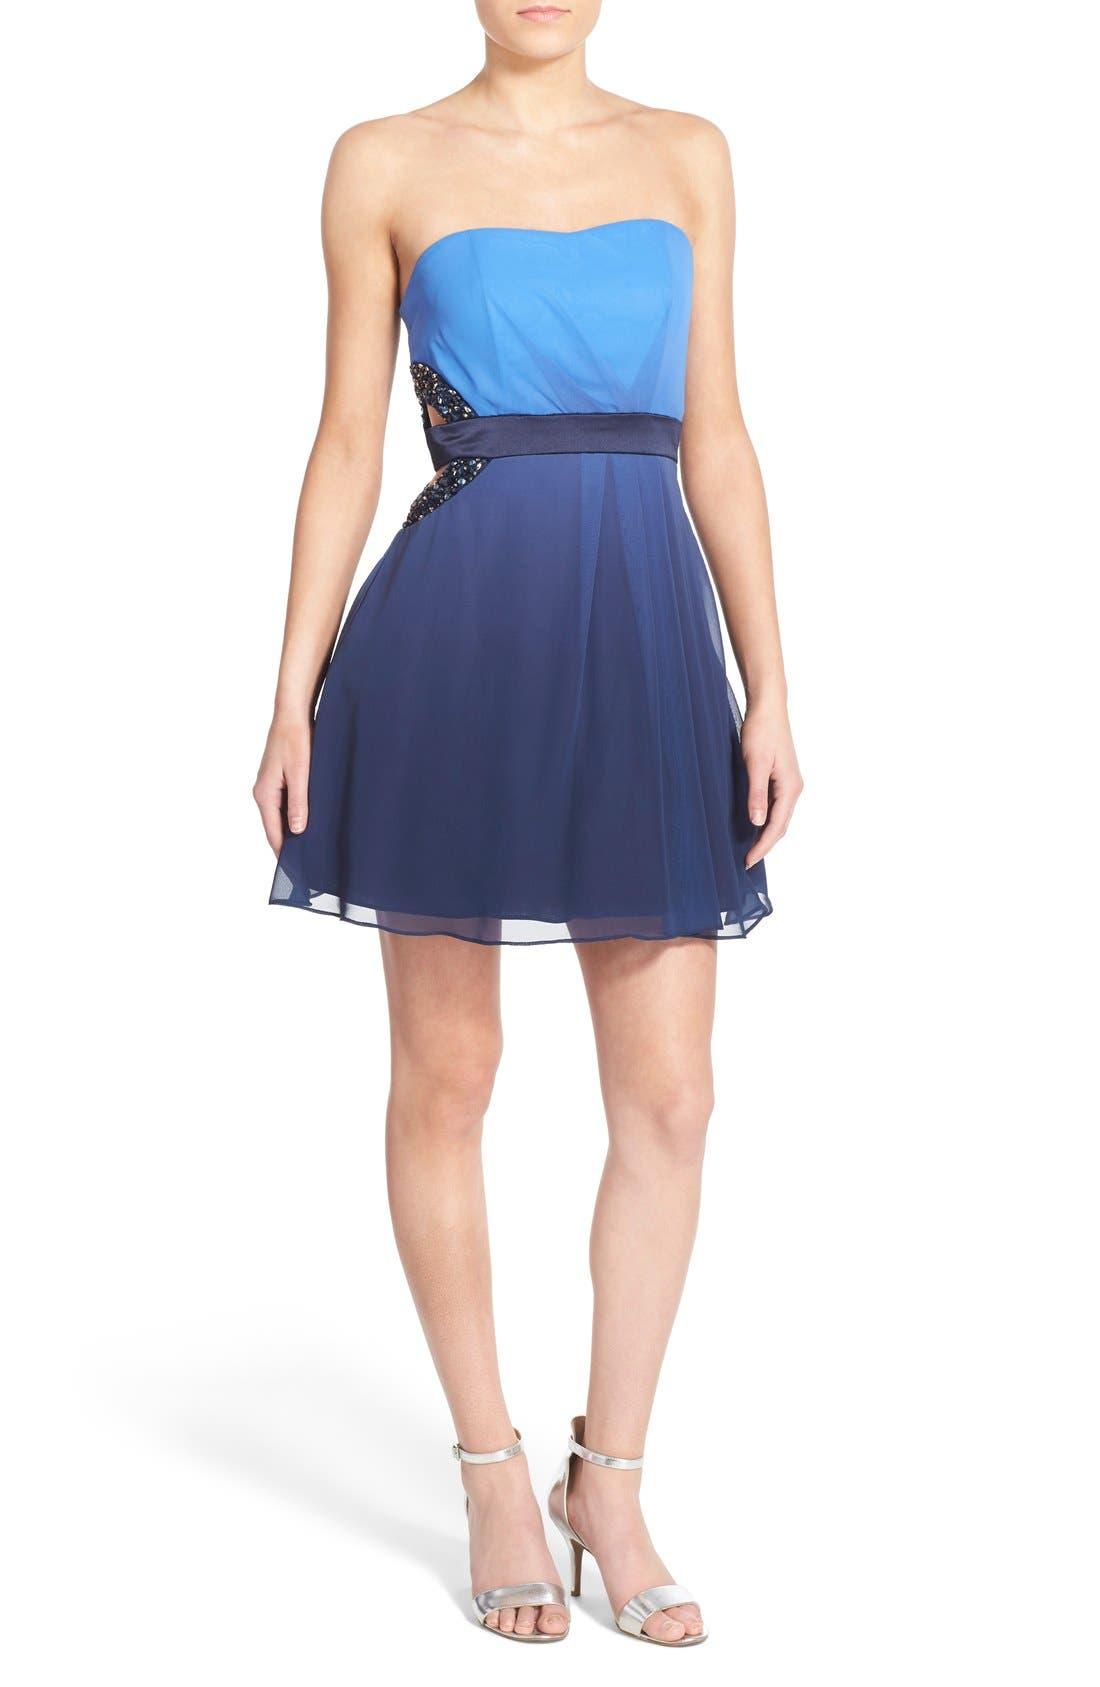 Main Image - Dear Moon Embellished Side Cutout Skater Dress